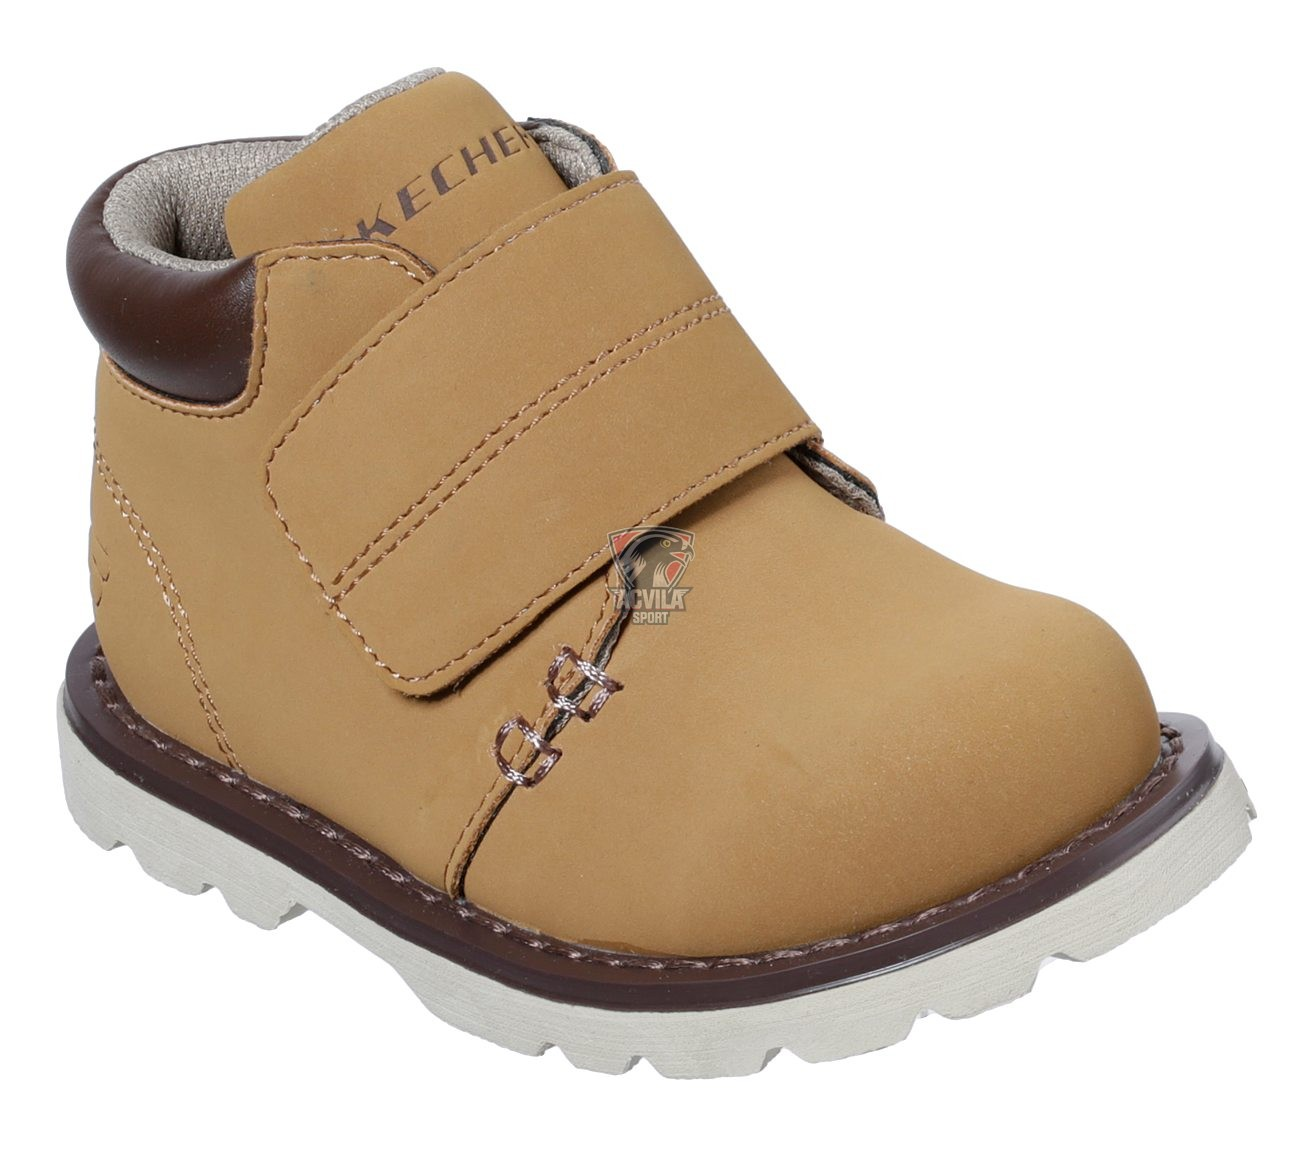 photo Обувь для детей SKECHERS BOWLAND